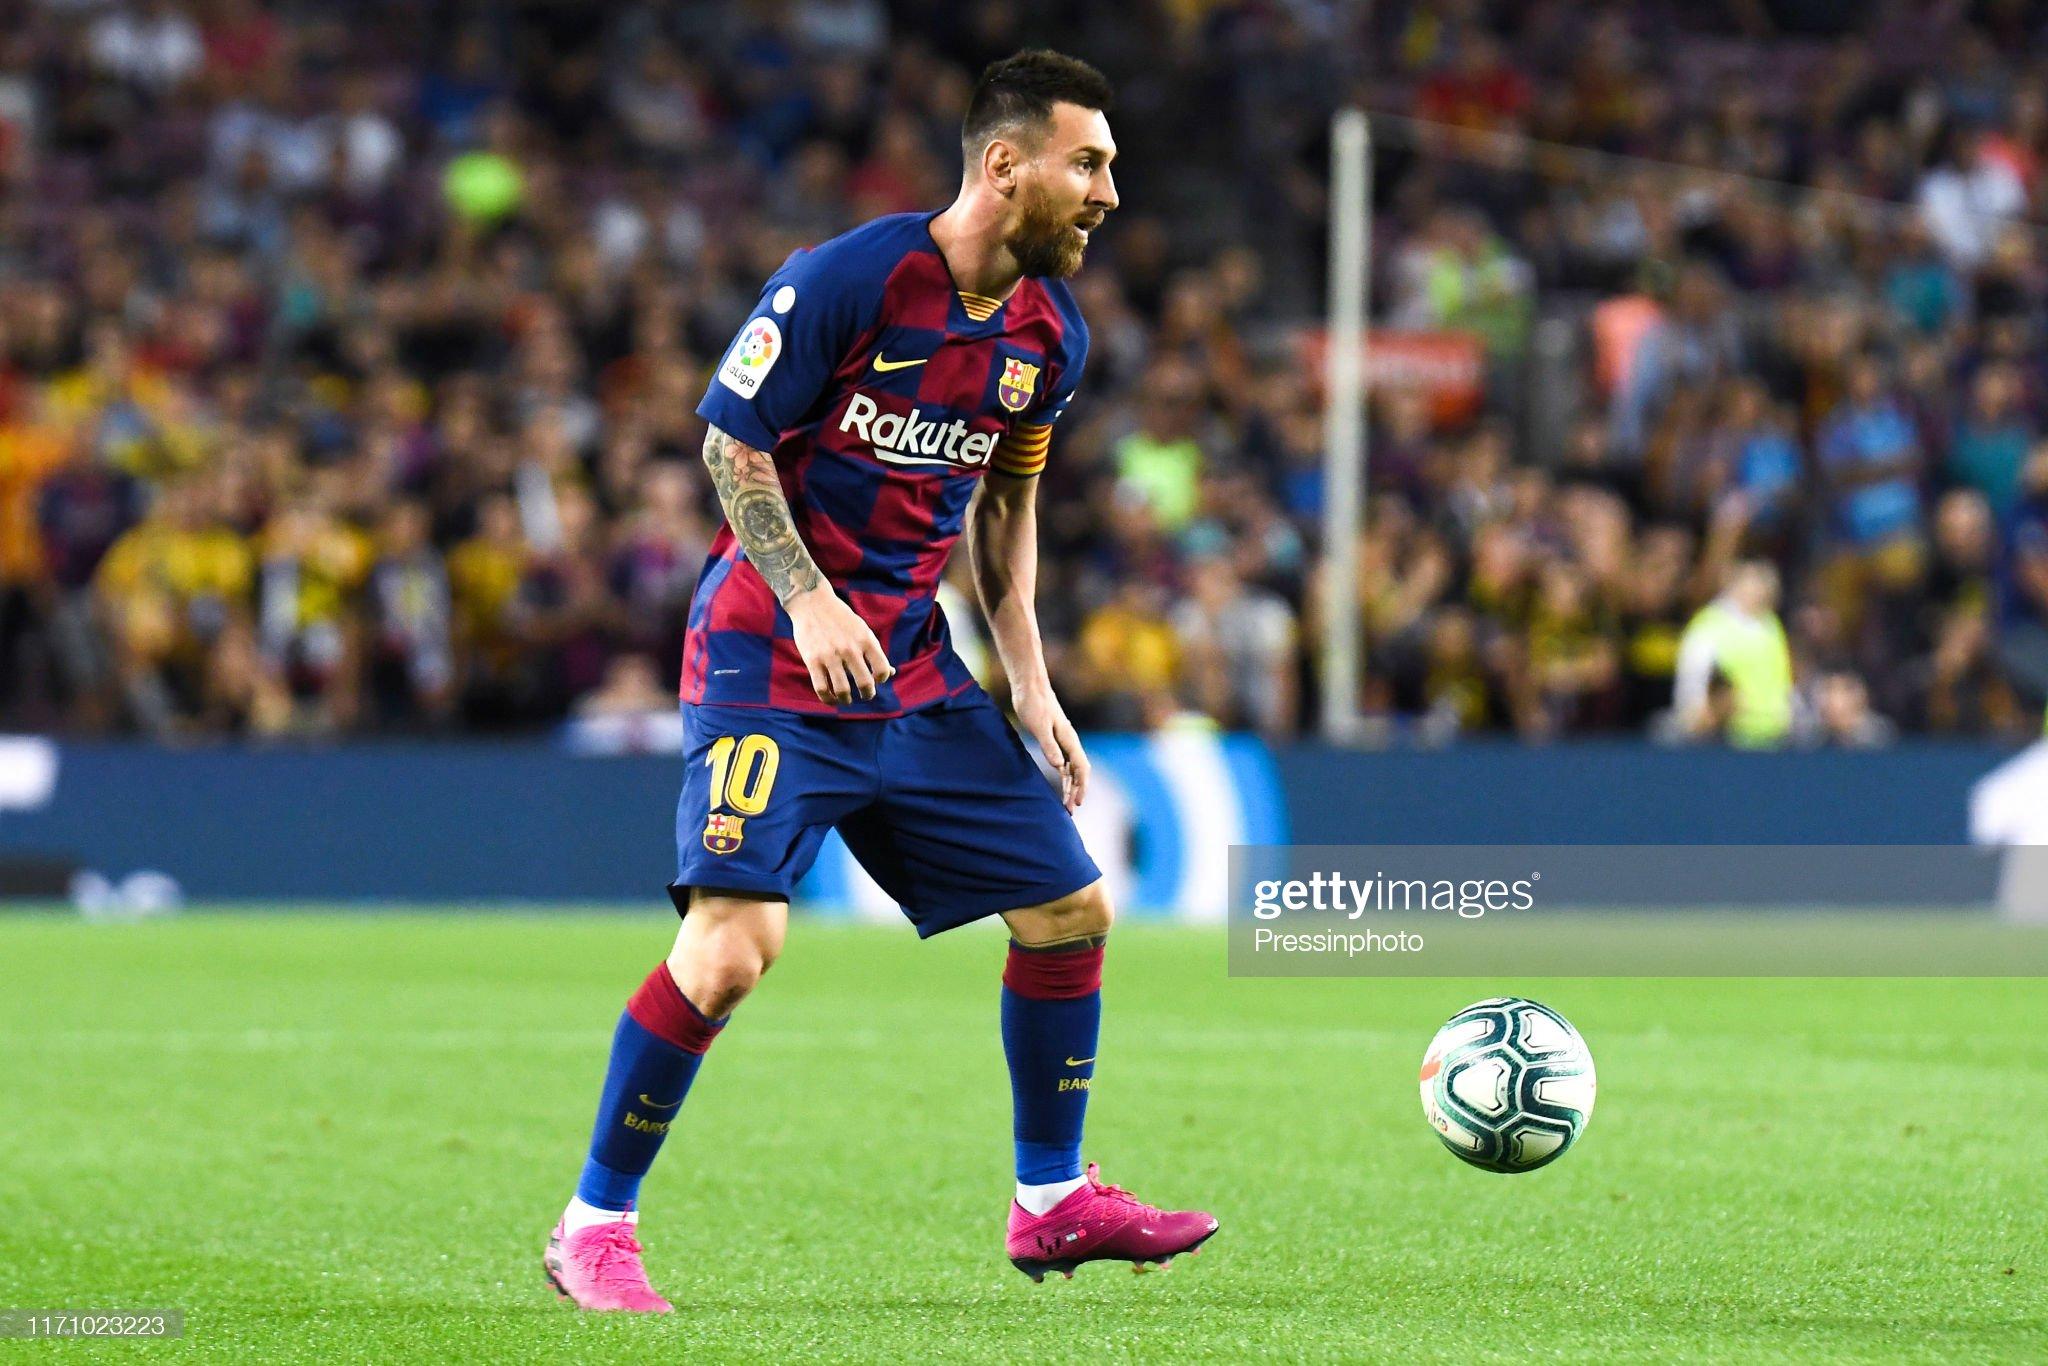 صور مباراة : برشلونة - فياريال 2-1 ( 24-09-2019 )  Lionel-messi-of-fc-barcelona-during-the-liga-match-between-barcelona-picture-id1171023223?s=2048x2048